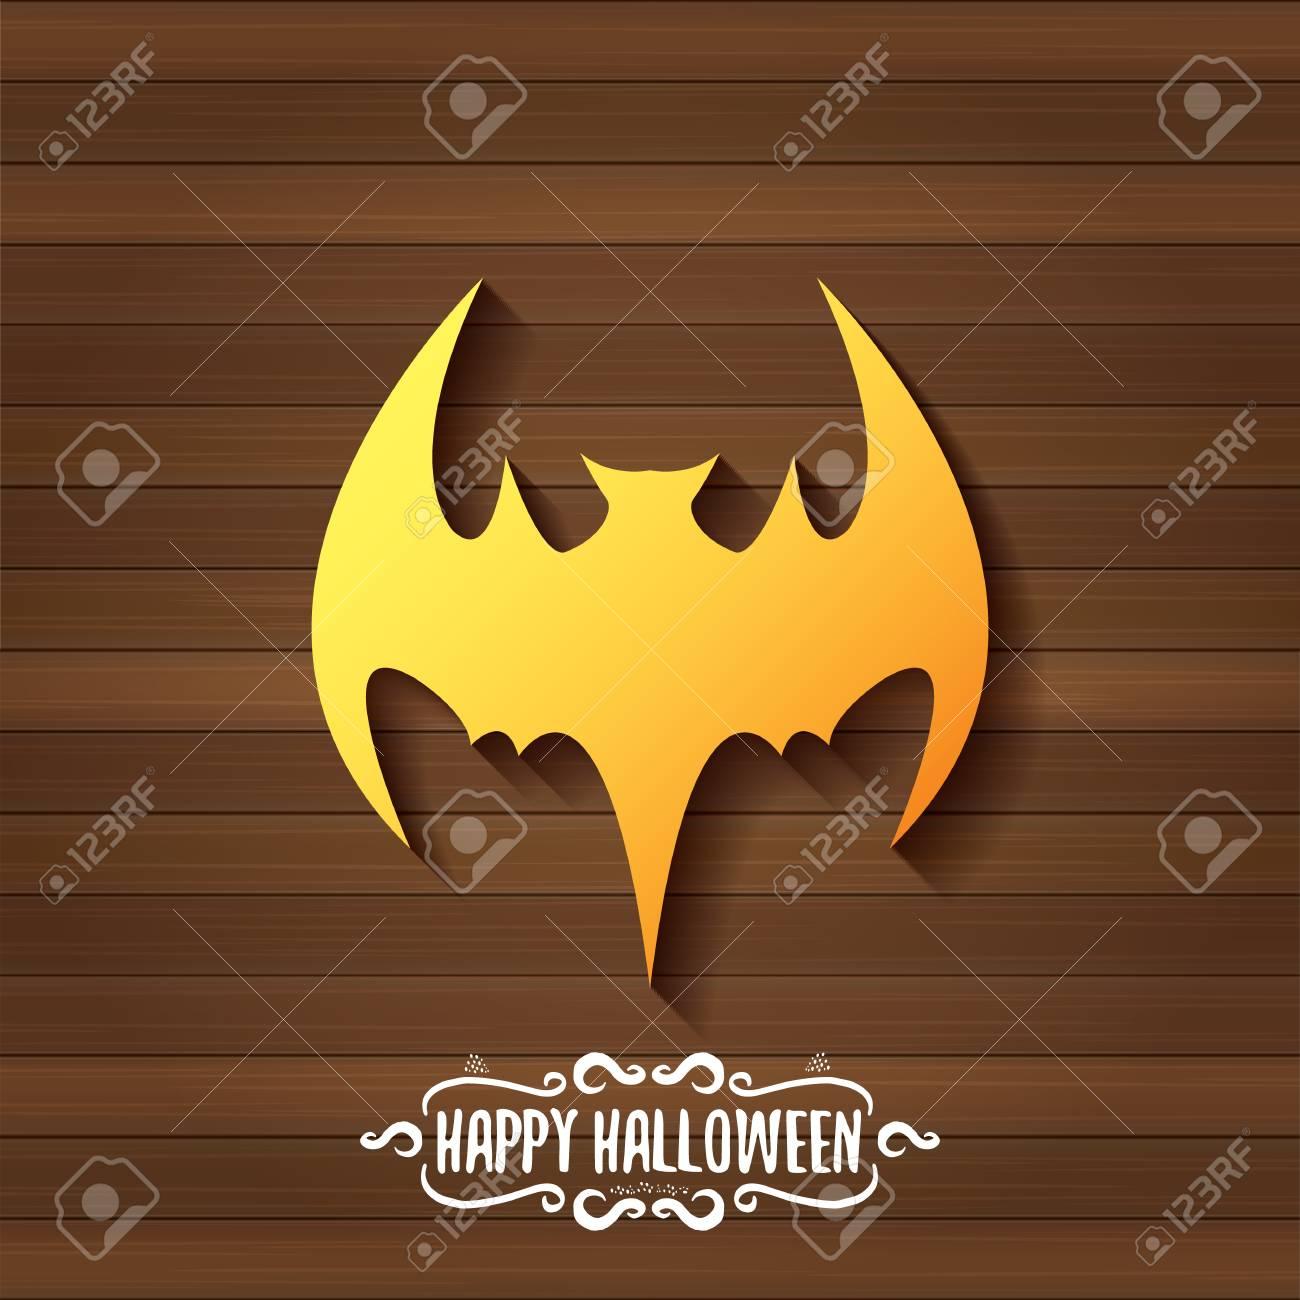 Vector Halloween Golden Bat Animal Silhouette Label On Dark Old